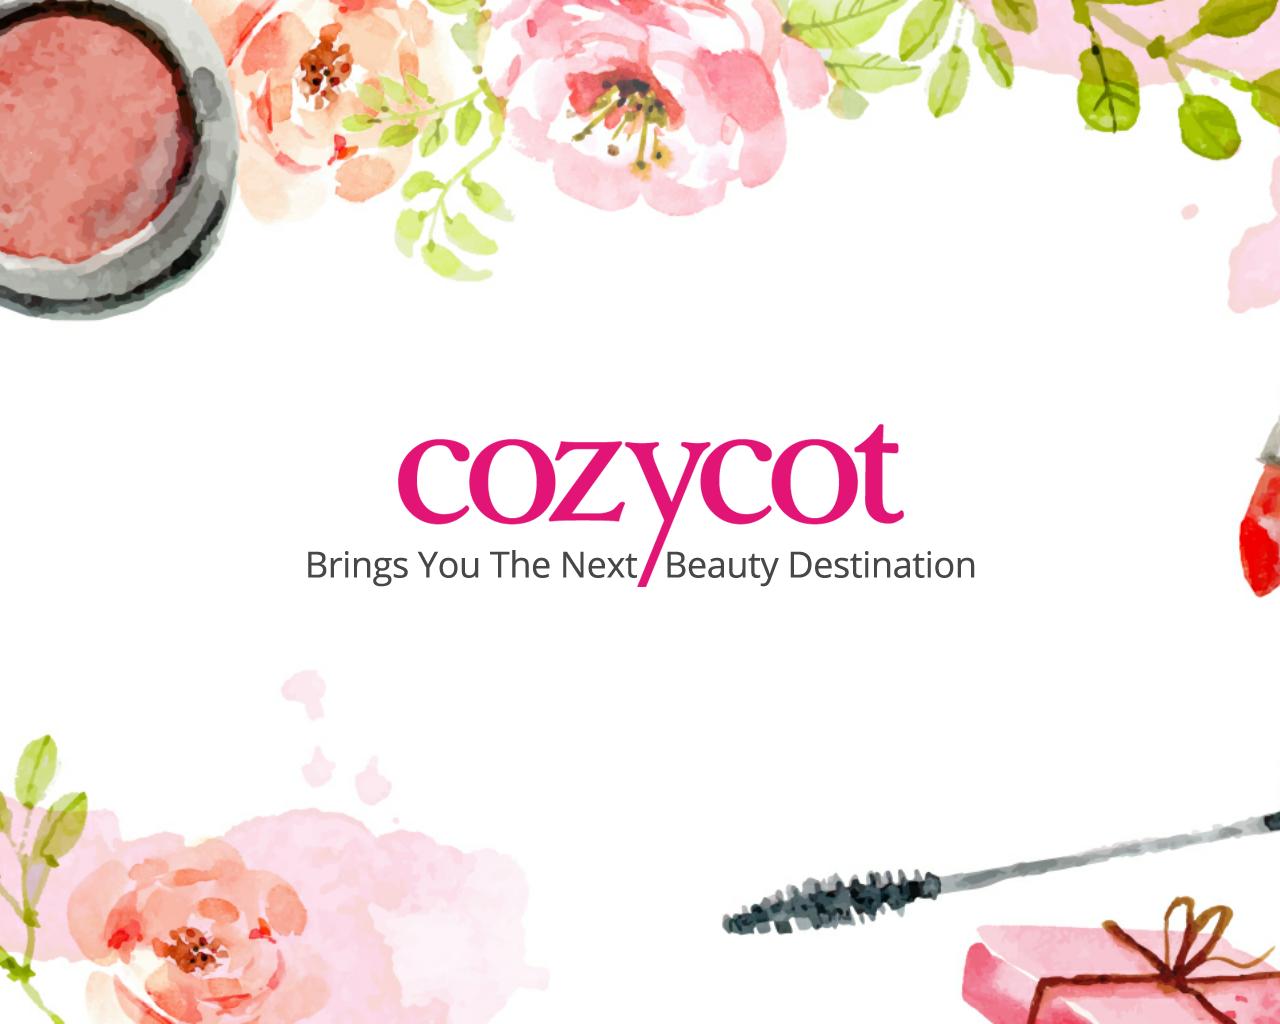 cozycot-Advertising-Reviews-Pricing